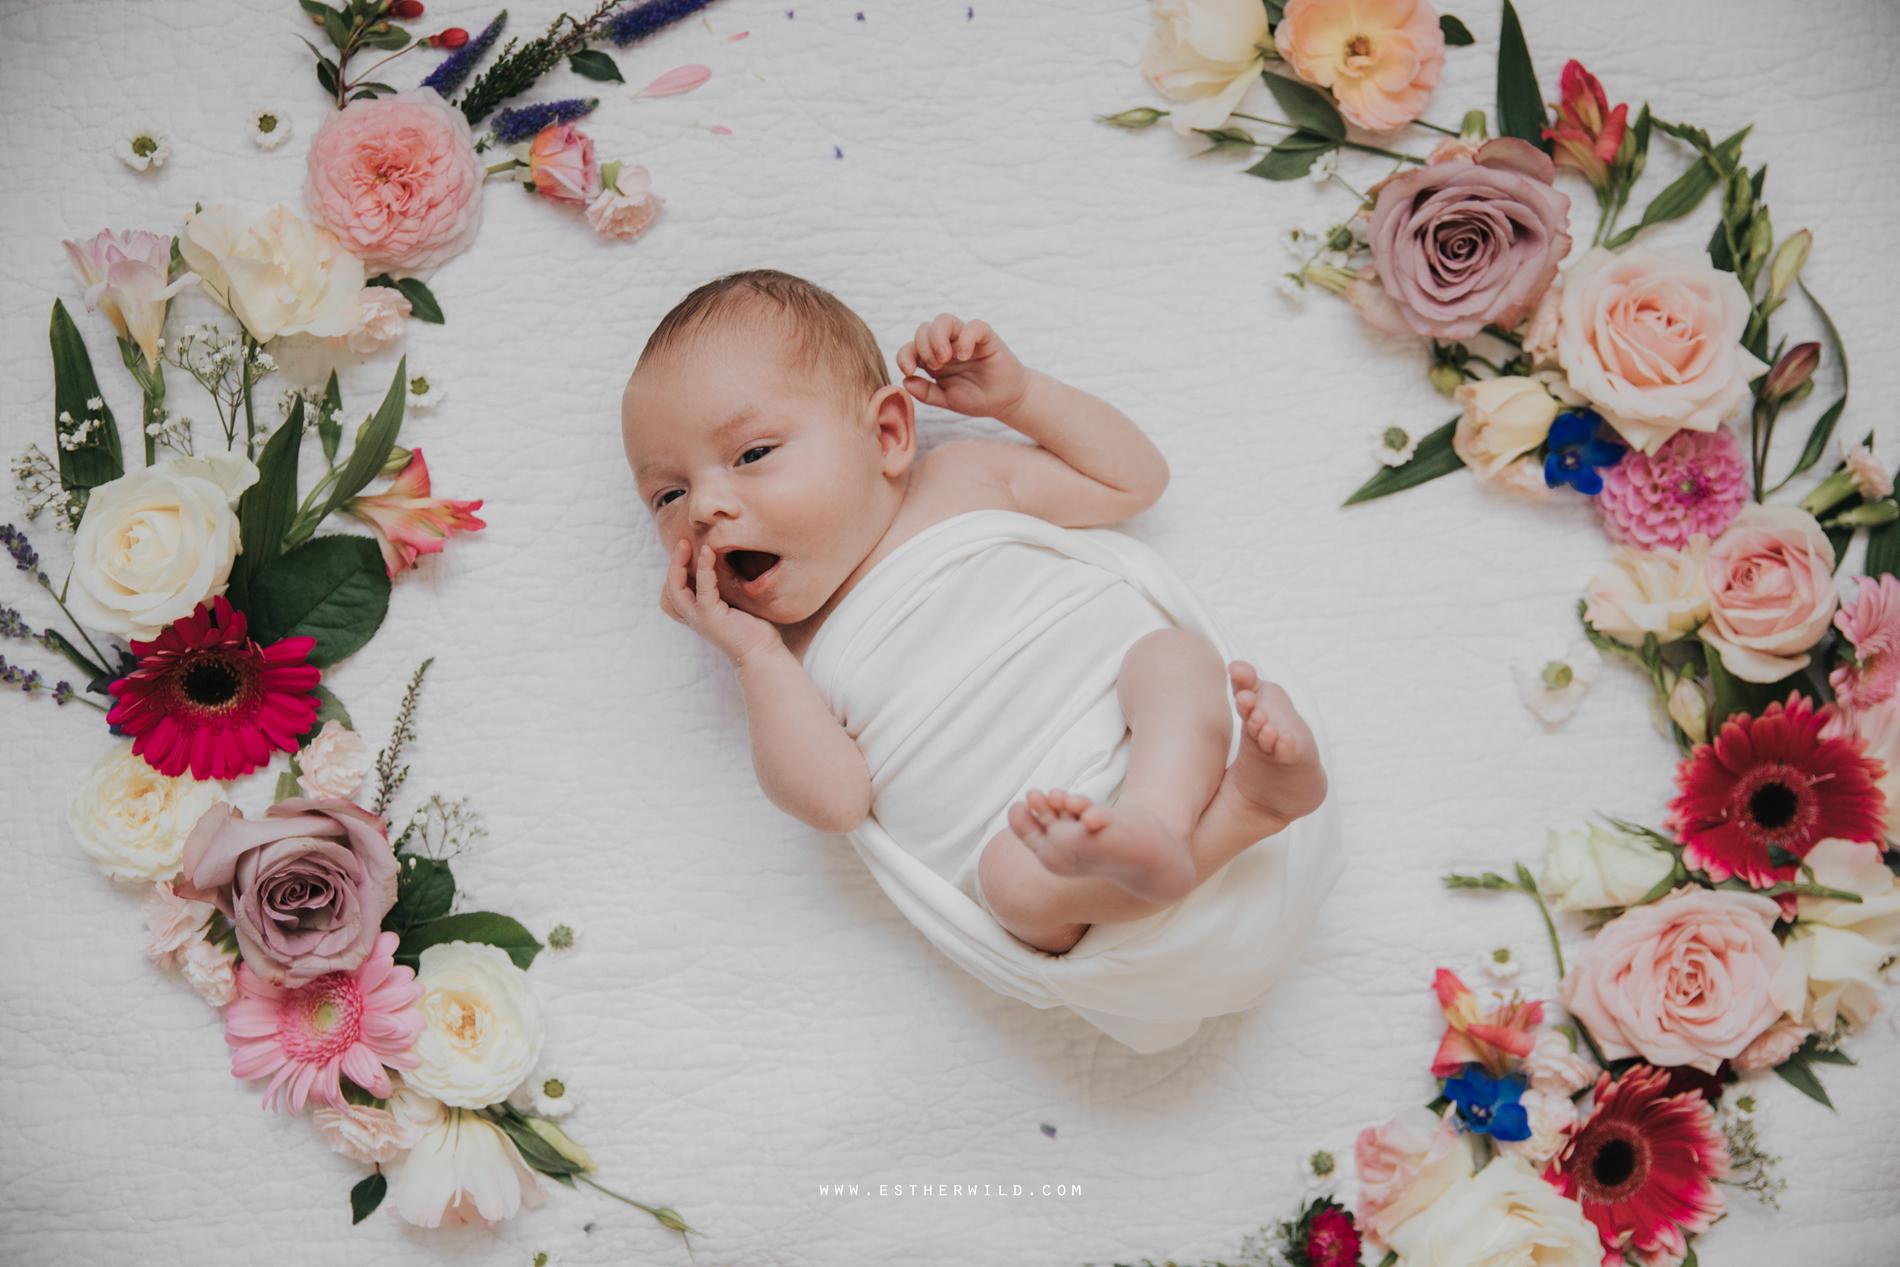 Newborn_Family_Photographer_Home_Norfolk_3R8A3836.jpg